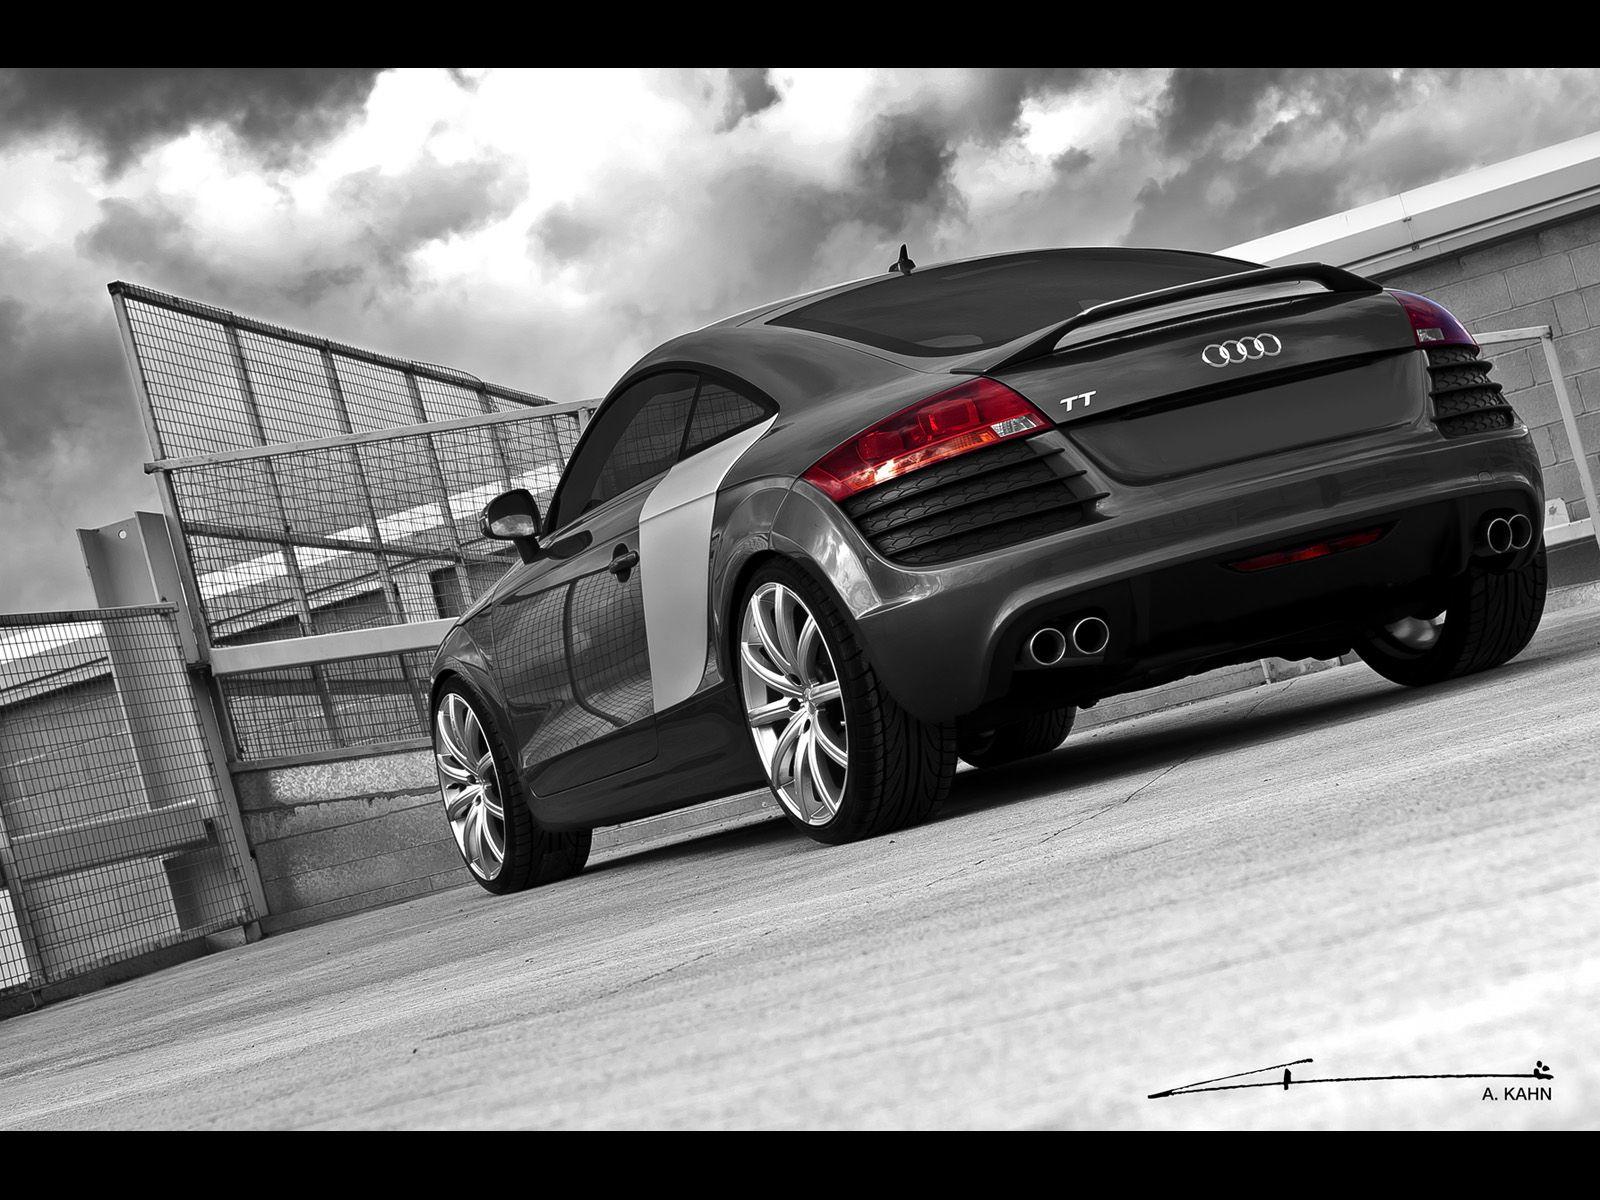 Luxury car toys  Audi TT  CarsToys  Pinterest  Audi TT Audi and Cars